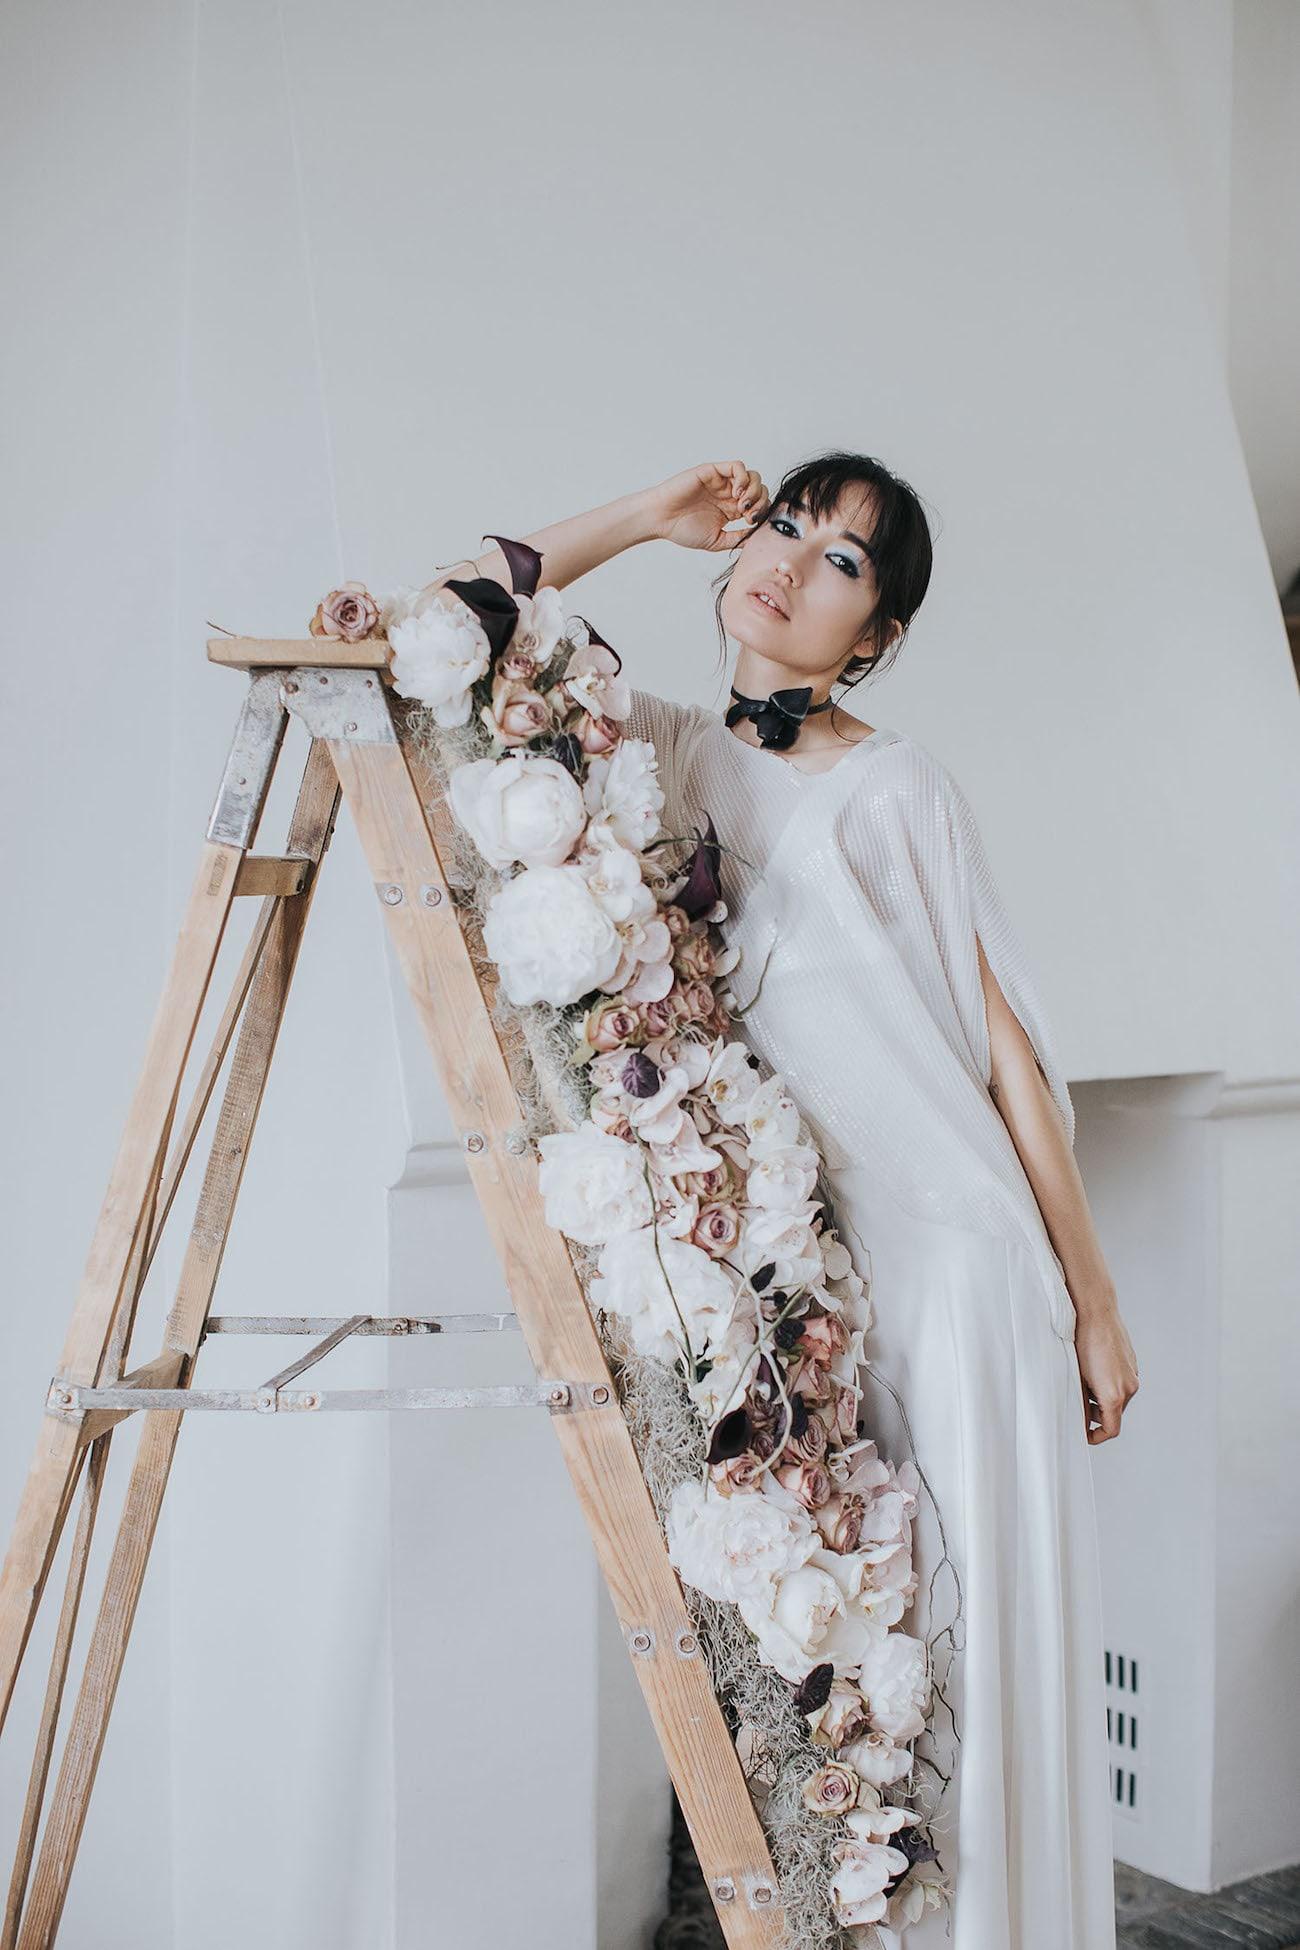 Modern Wedding Dress | Credit: Cornelia Lietz